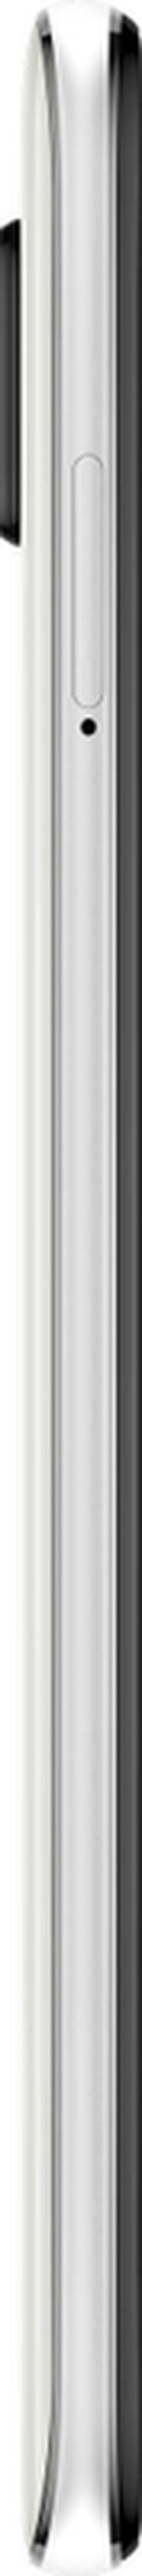 Мобильный телефон Xiaomi Redmi Note 9S 4Gb/64Gb Glacier White